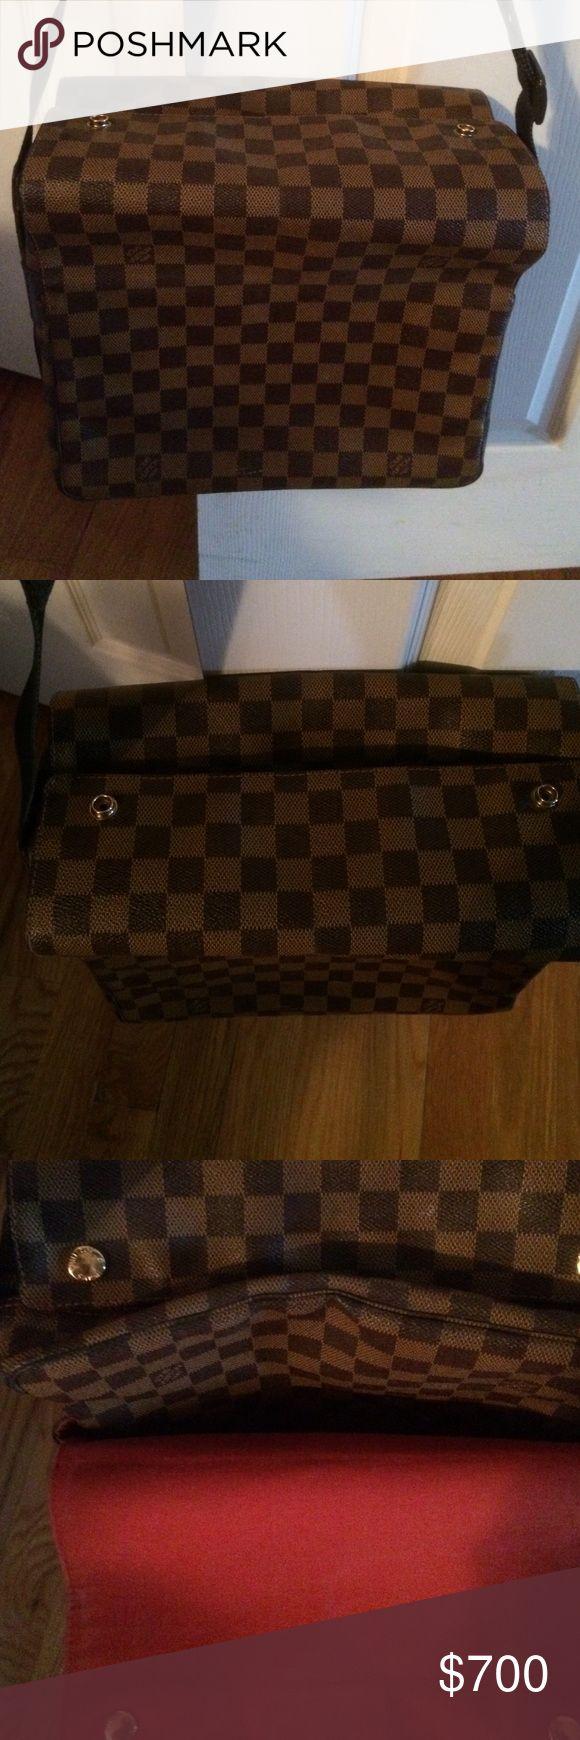 Louis Vuitton Naviglio Crossbody shoulder handbag Louis Vuitton Bags Crossbody Bags